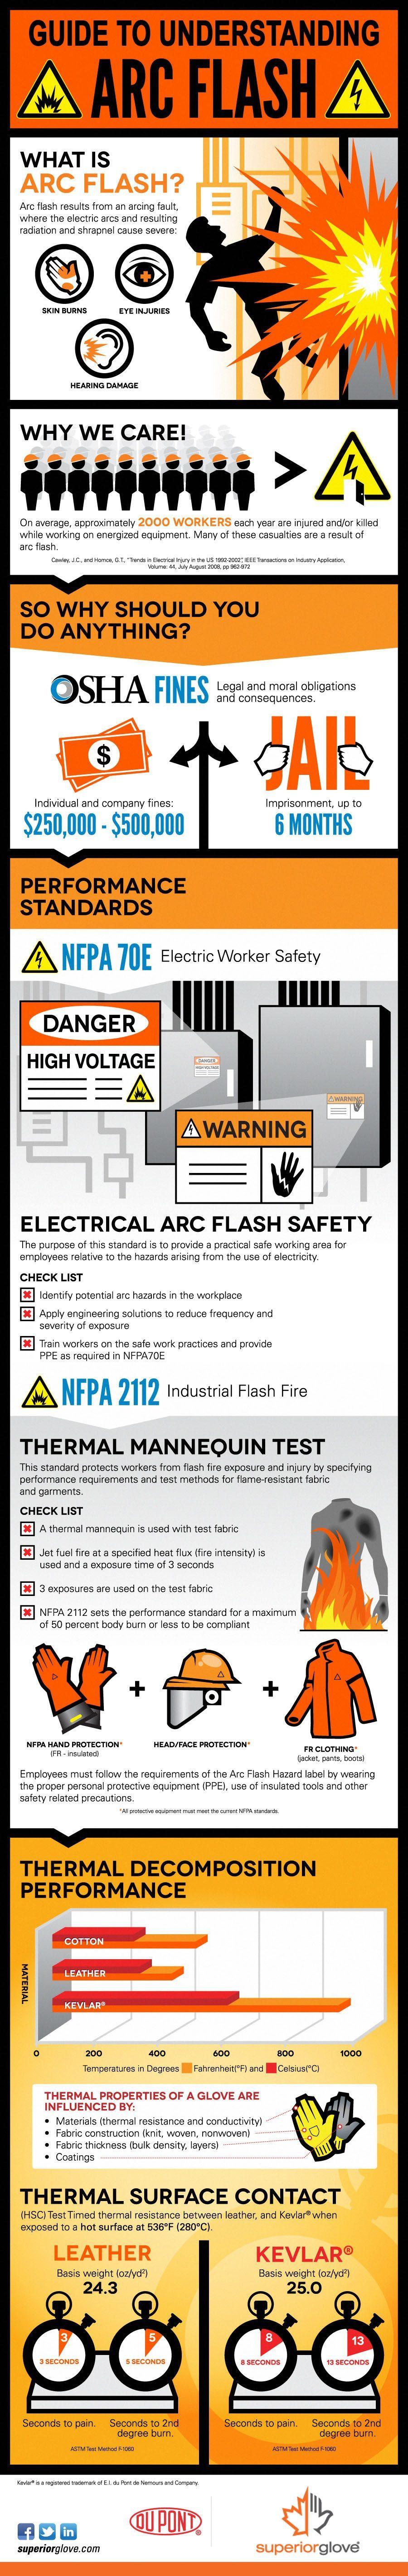 Superior-Glove-Arc-Flash-Infographic